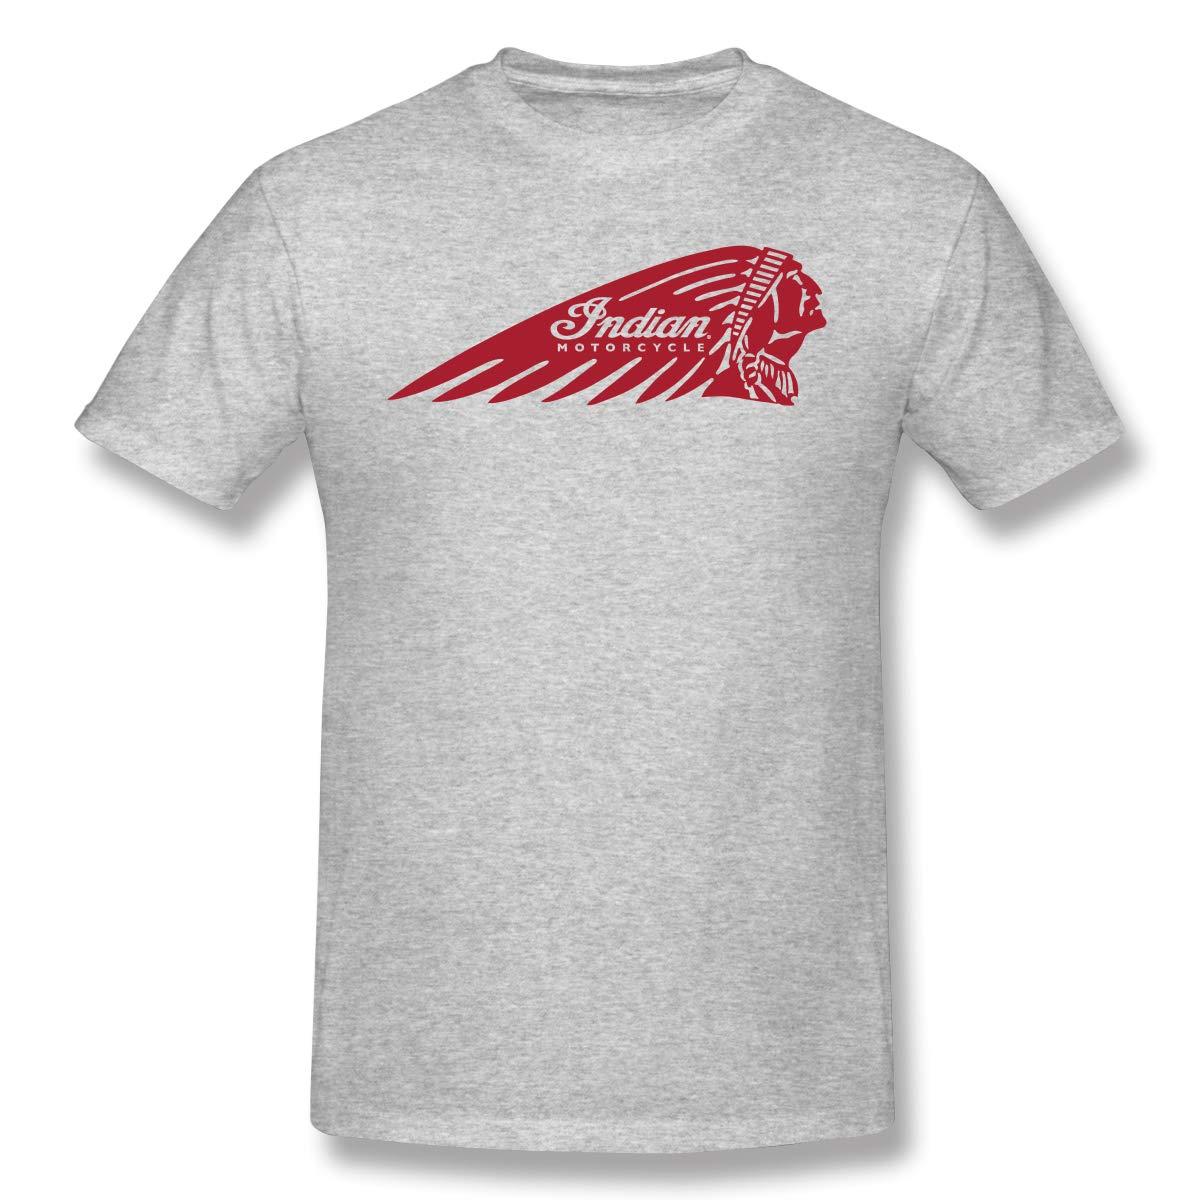 Davidbill T Shirt For Indian Motorcycles Logo Cool Short Sleeve Tee 5471